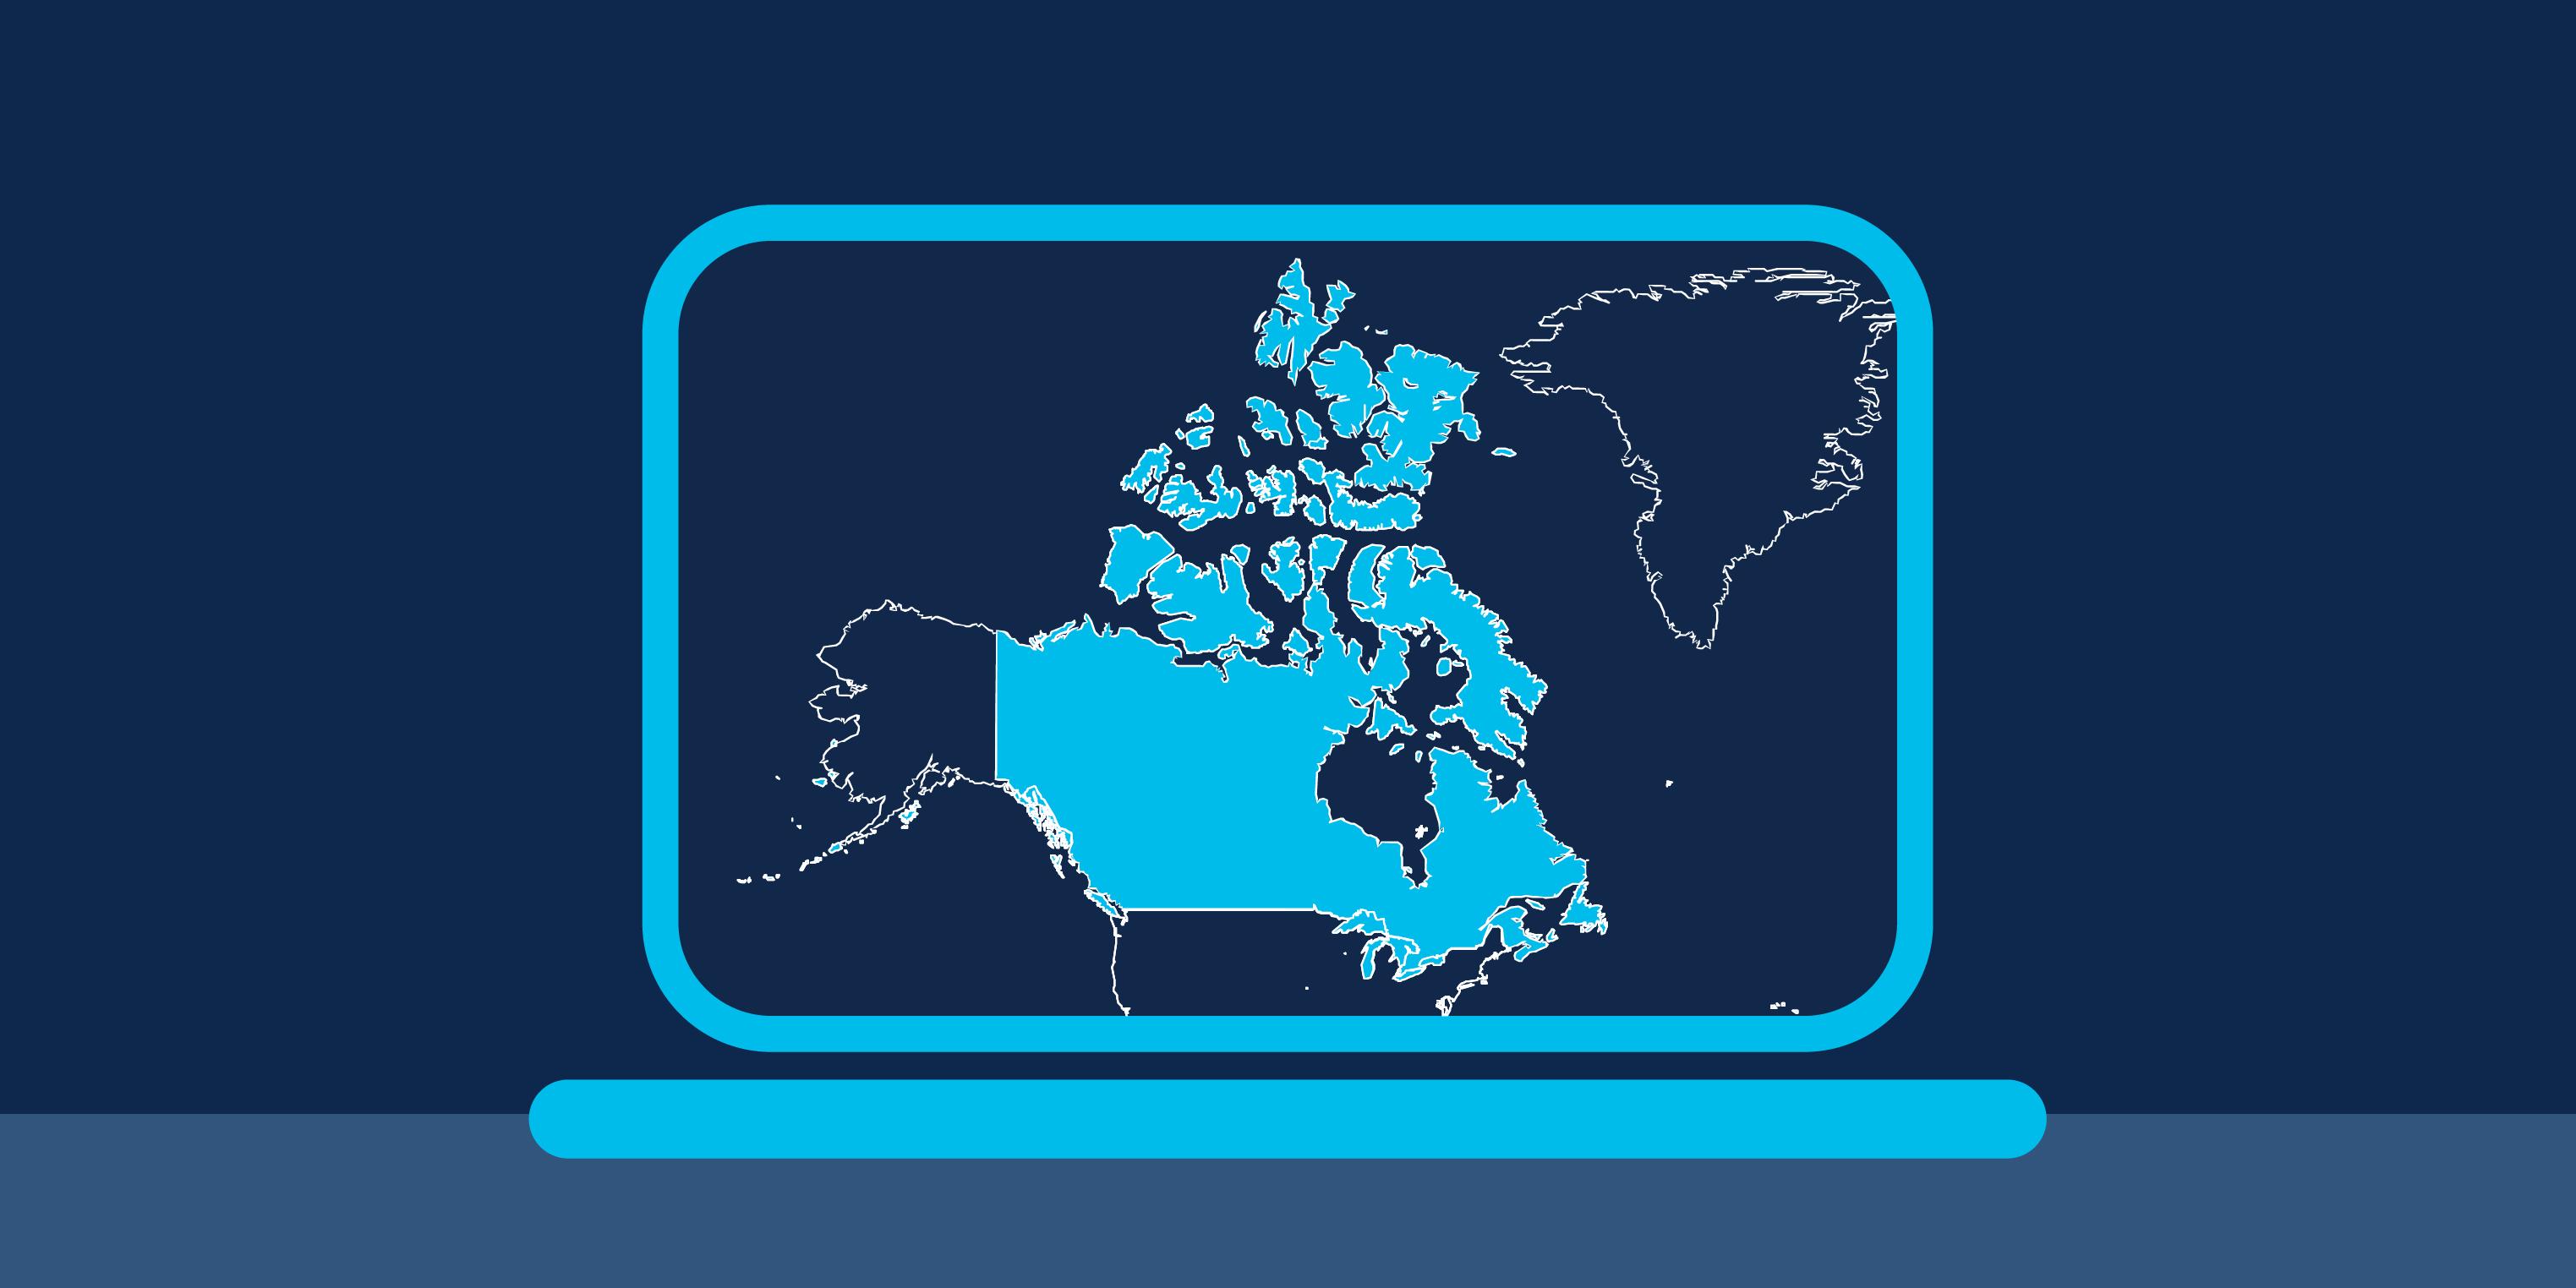 Canada map laptop screen